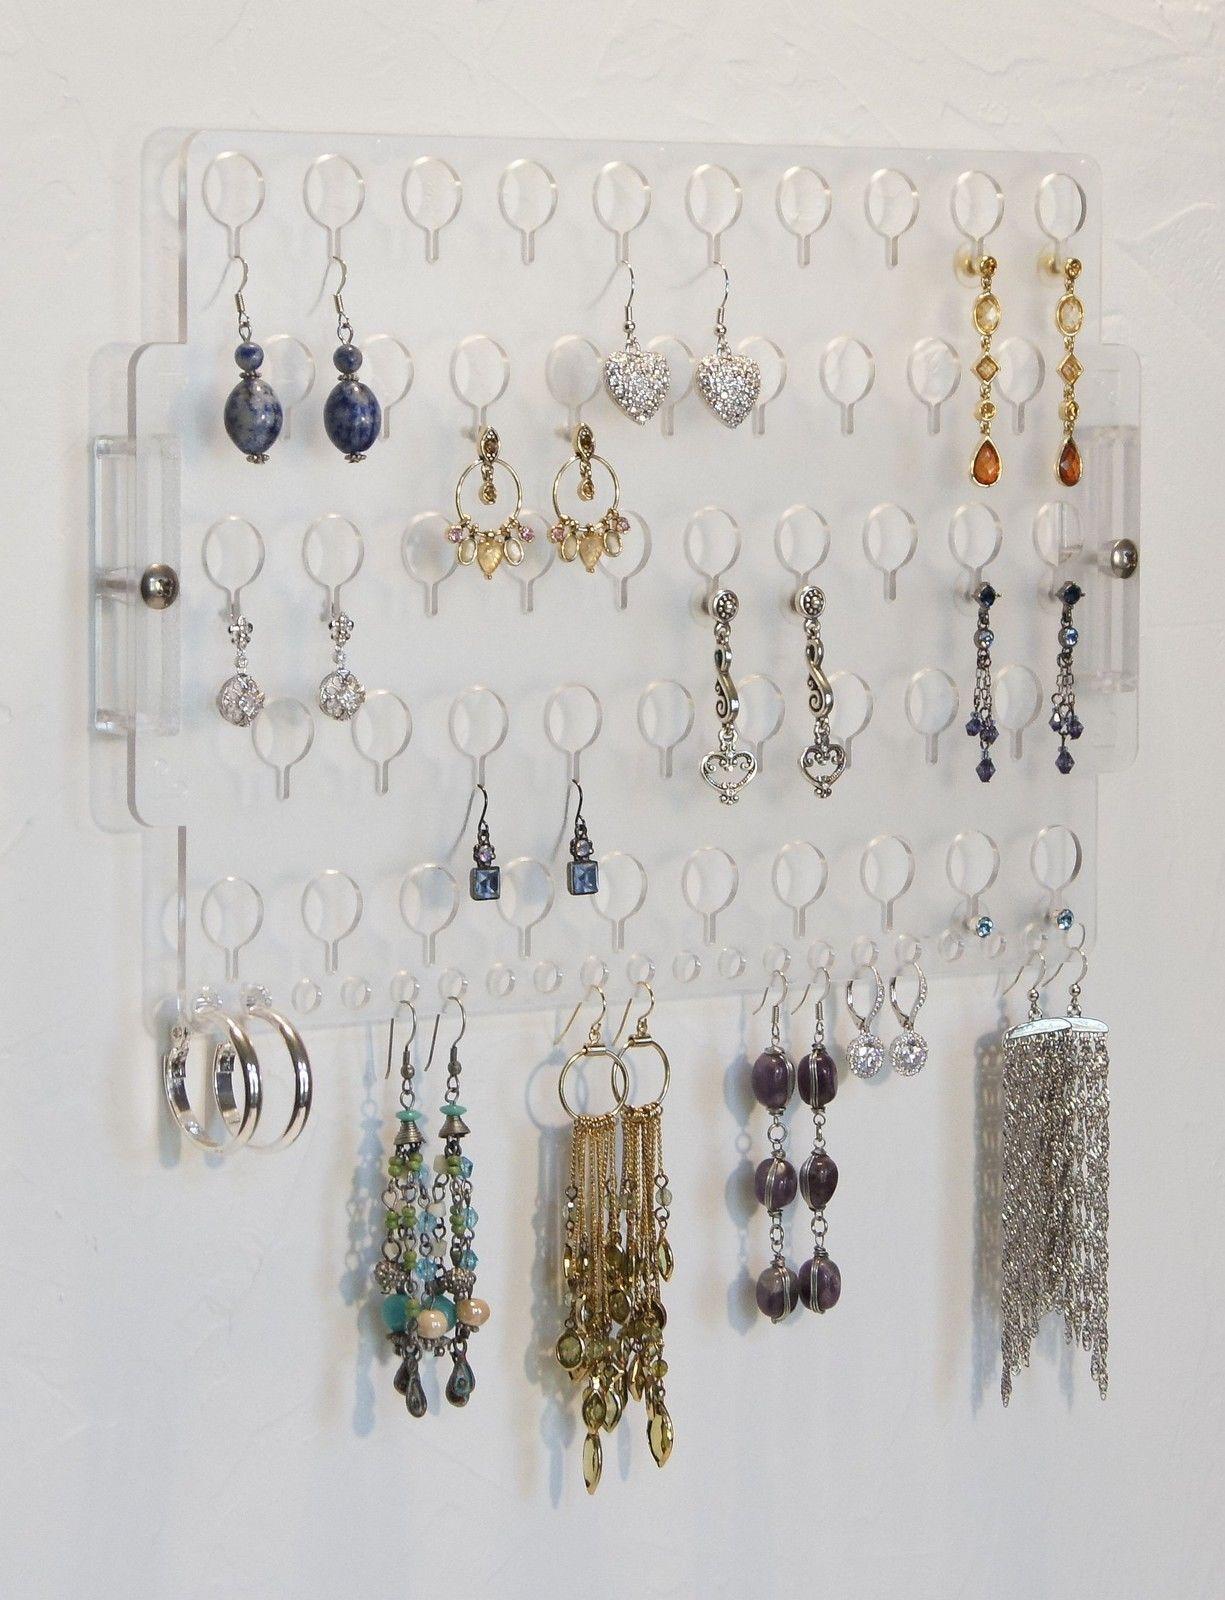 Wall Earring Holder Hanging Jewelry Organizer Closet Storage Rack